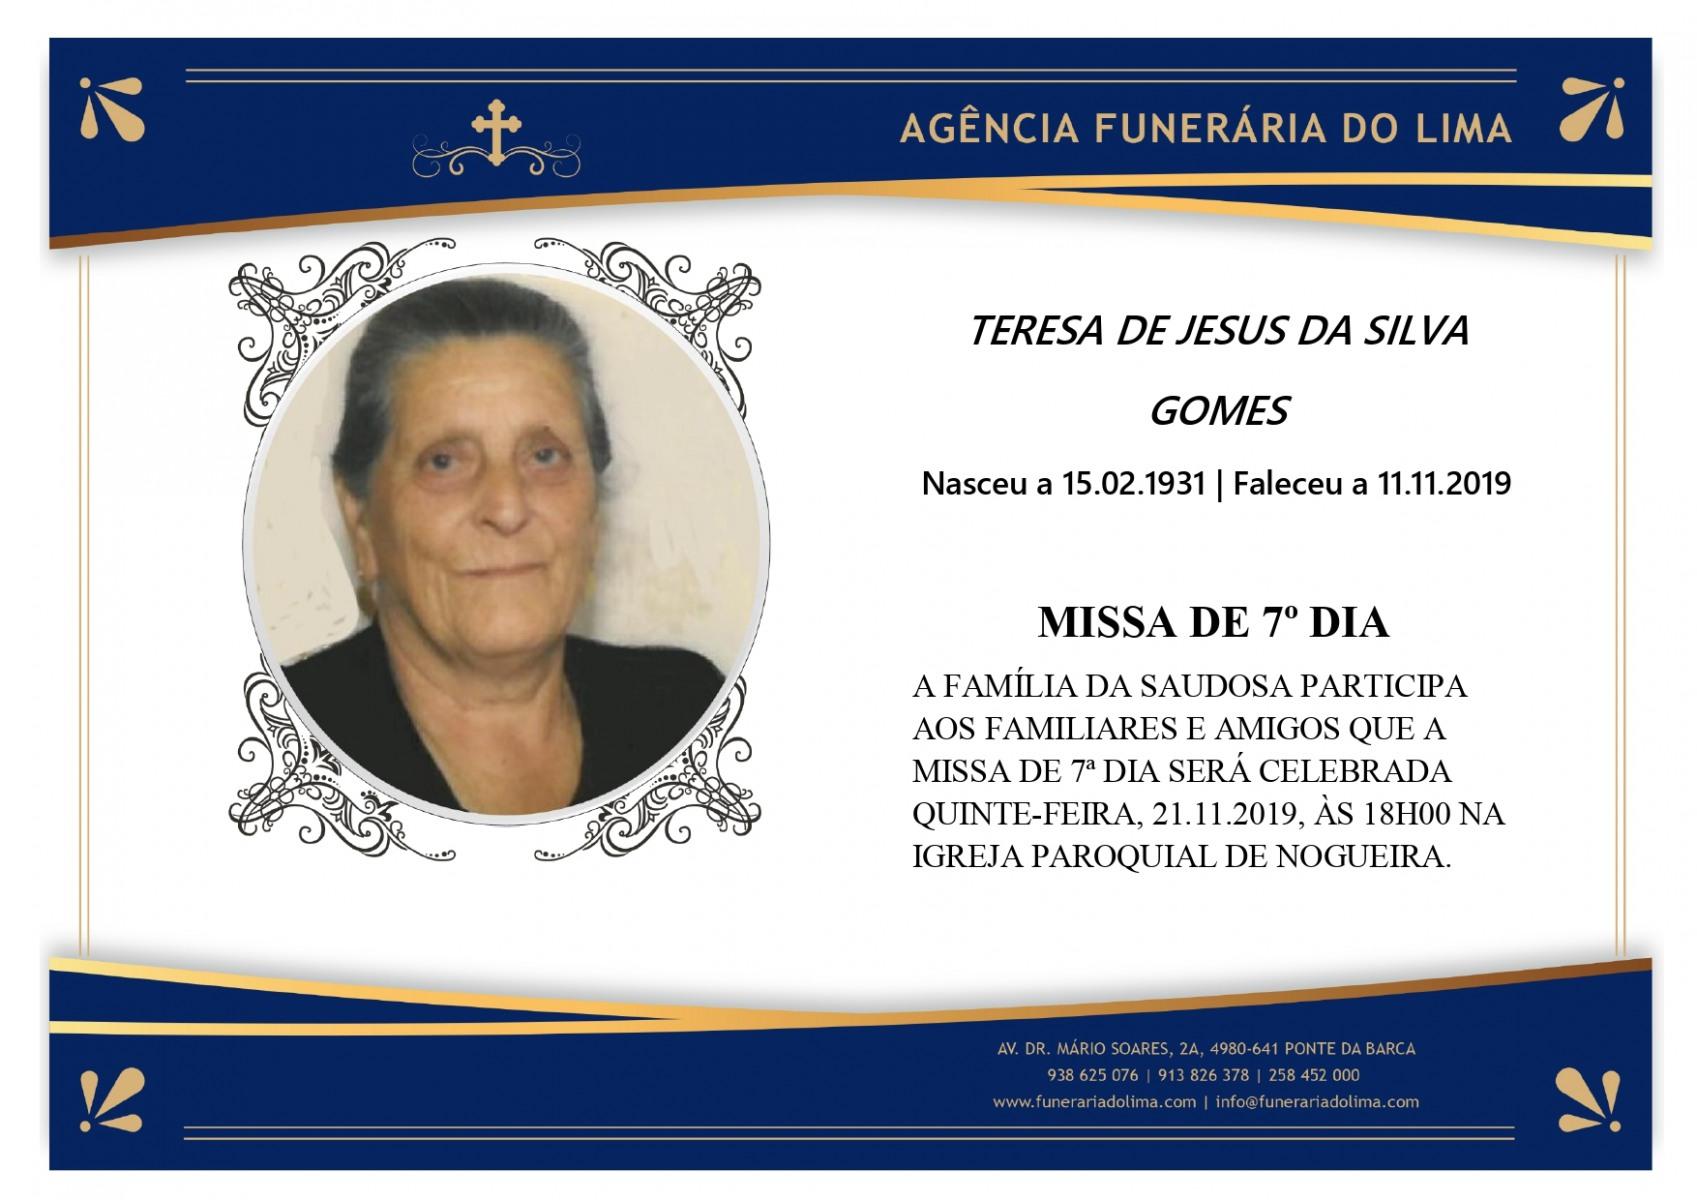 Teresa de Jesus da Silva Gomes